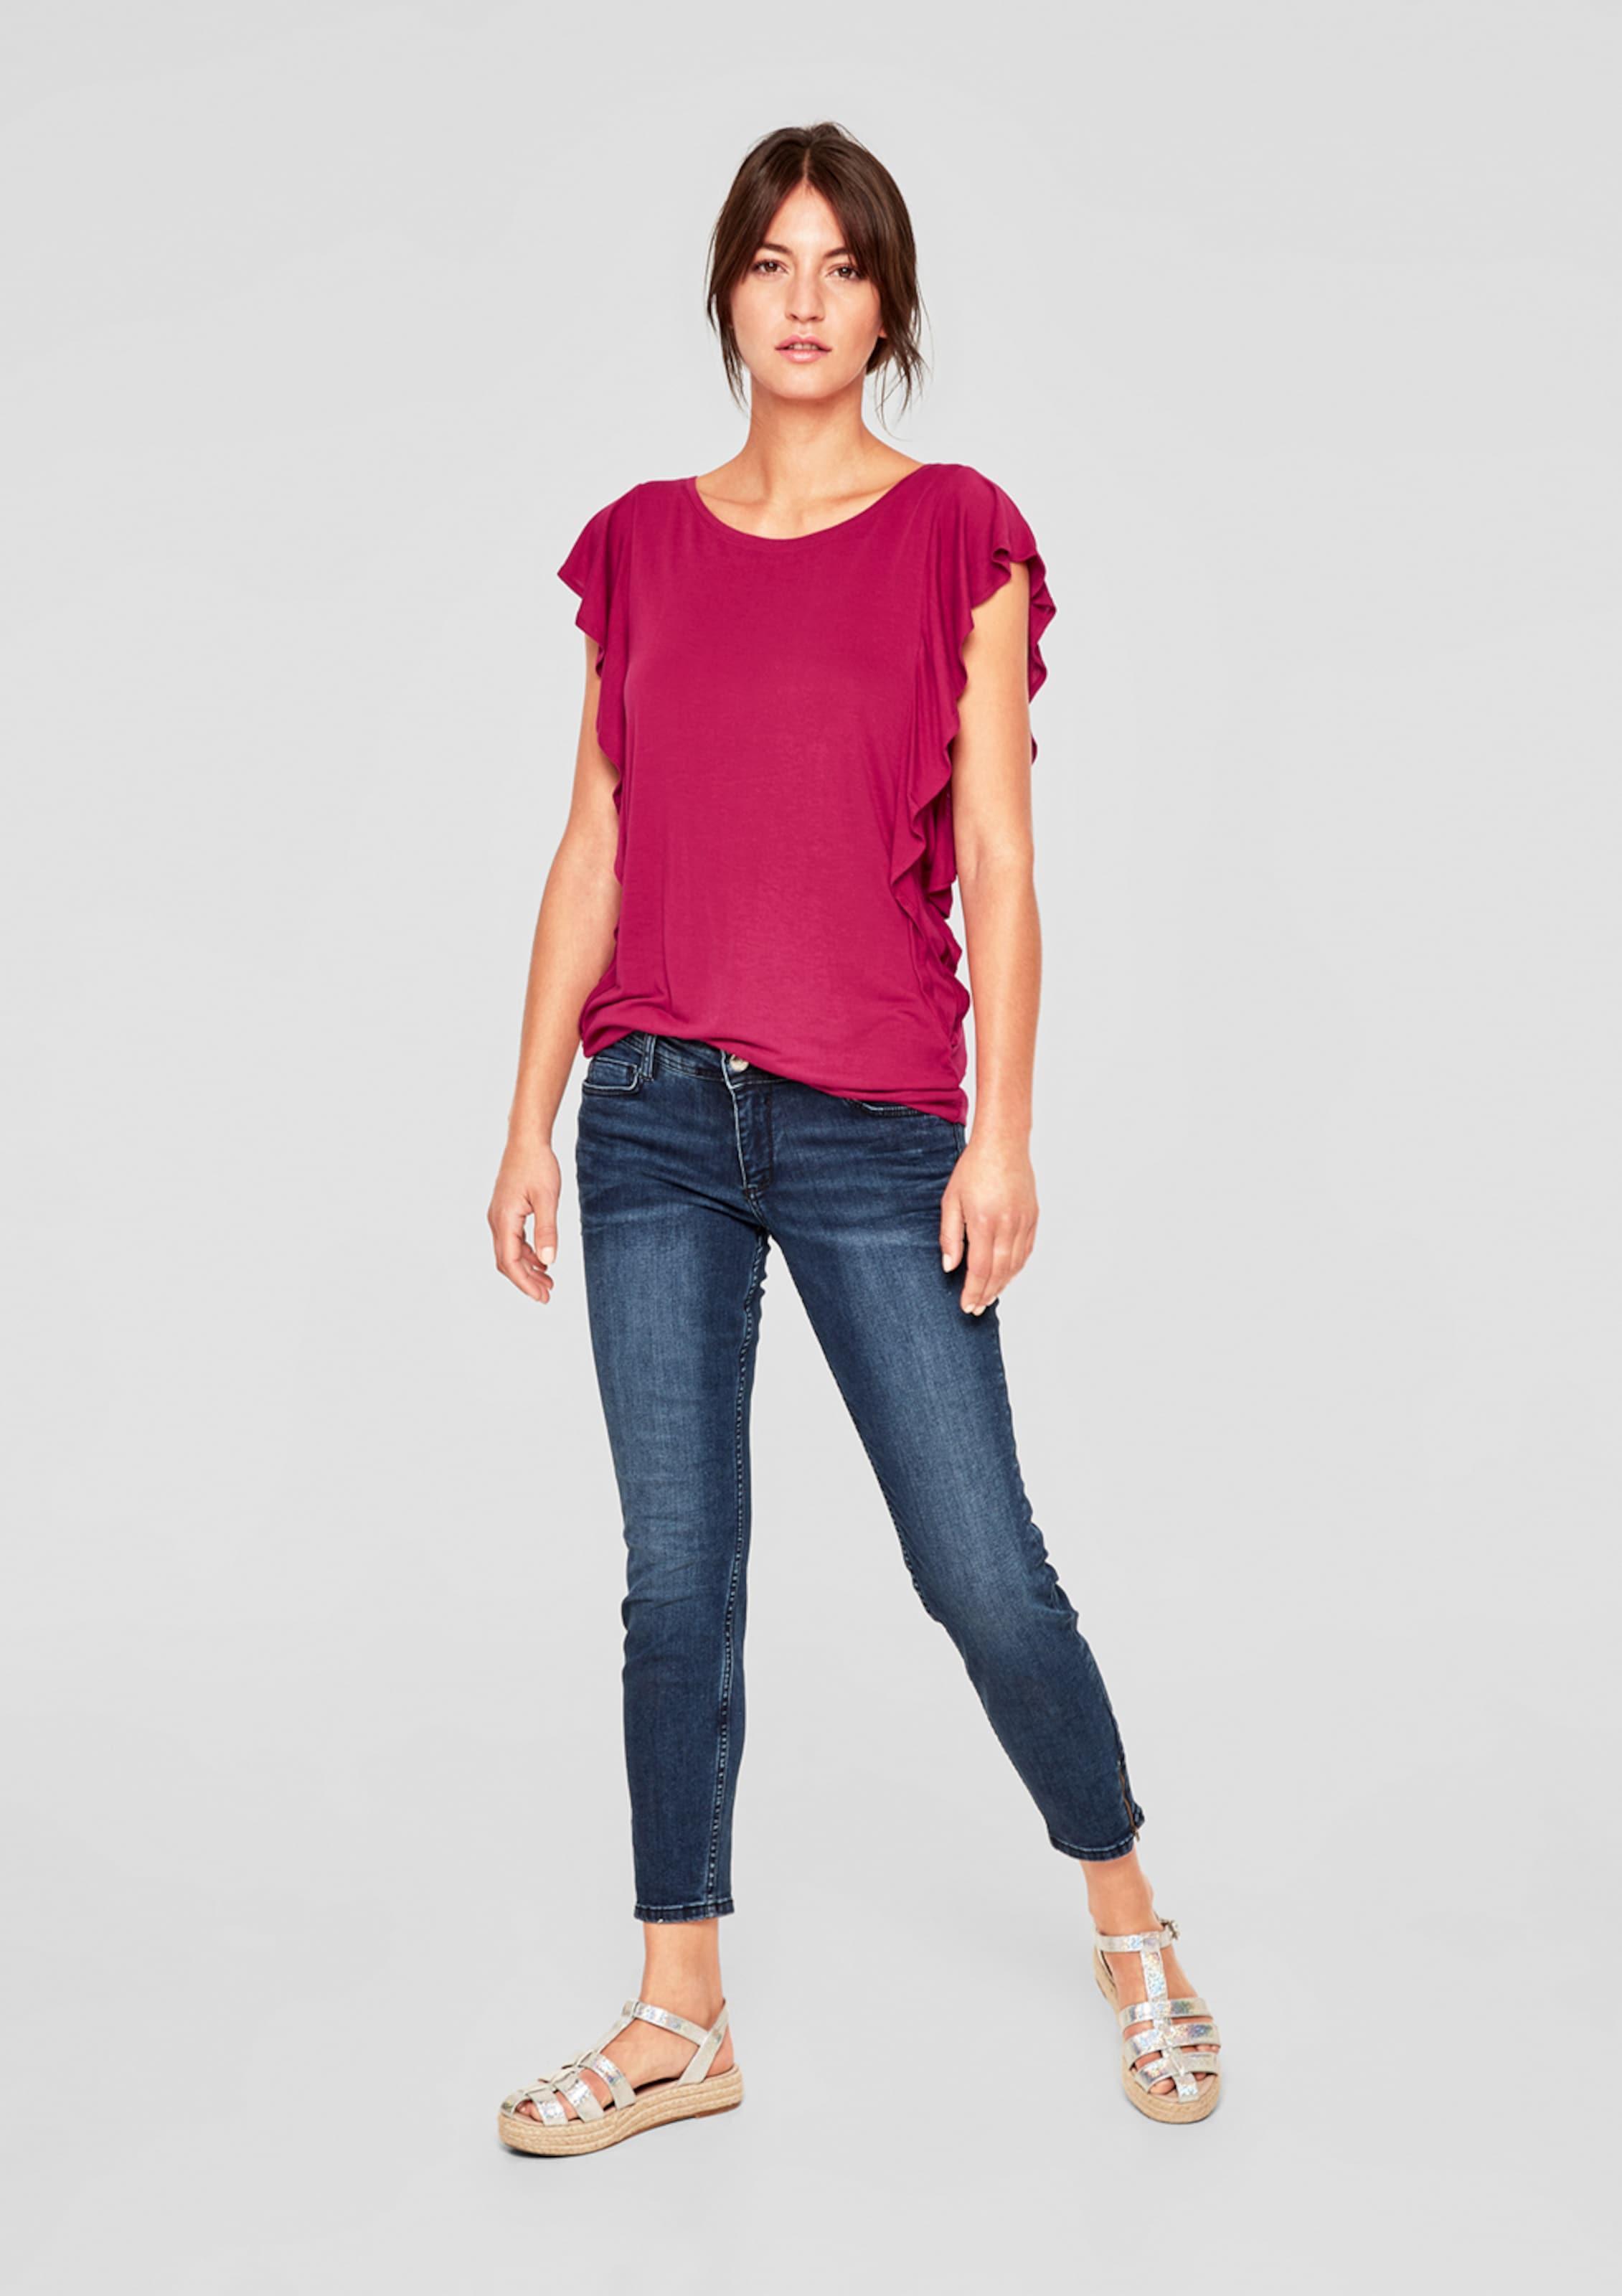 Shirt S oliver S Pink In yN08wPmvnO